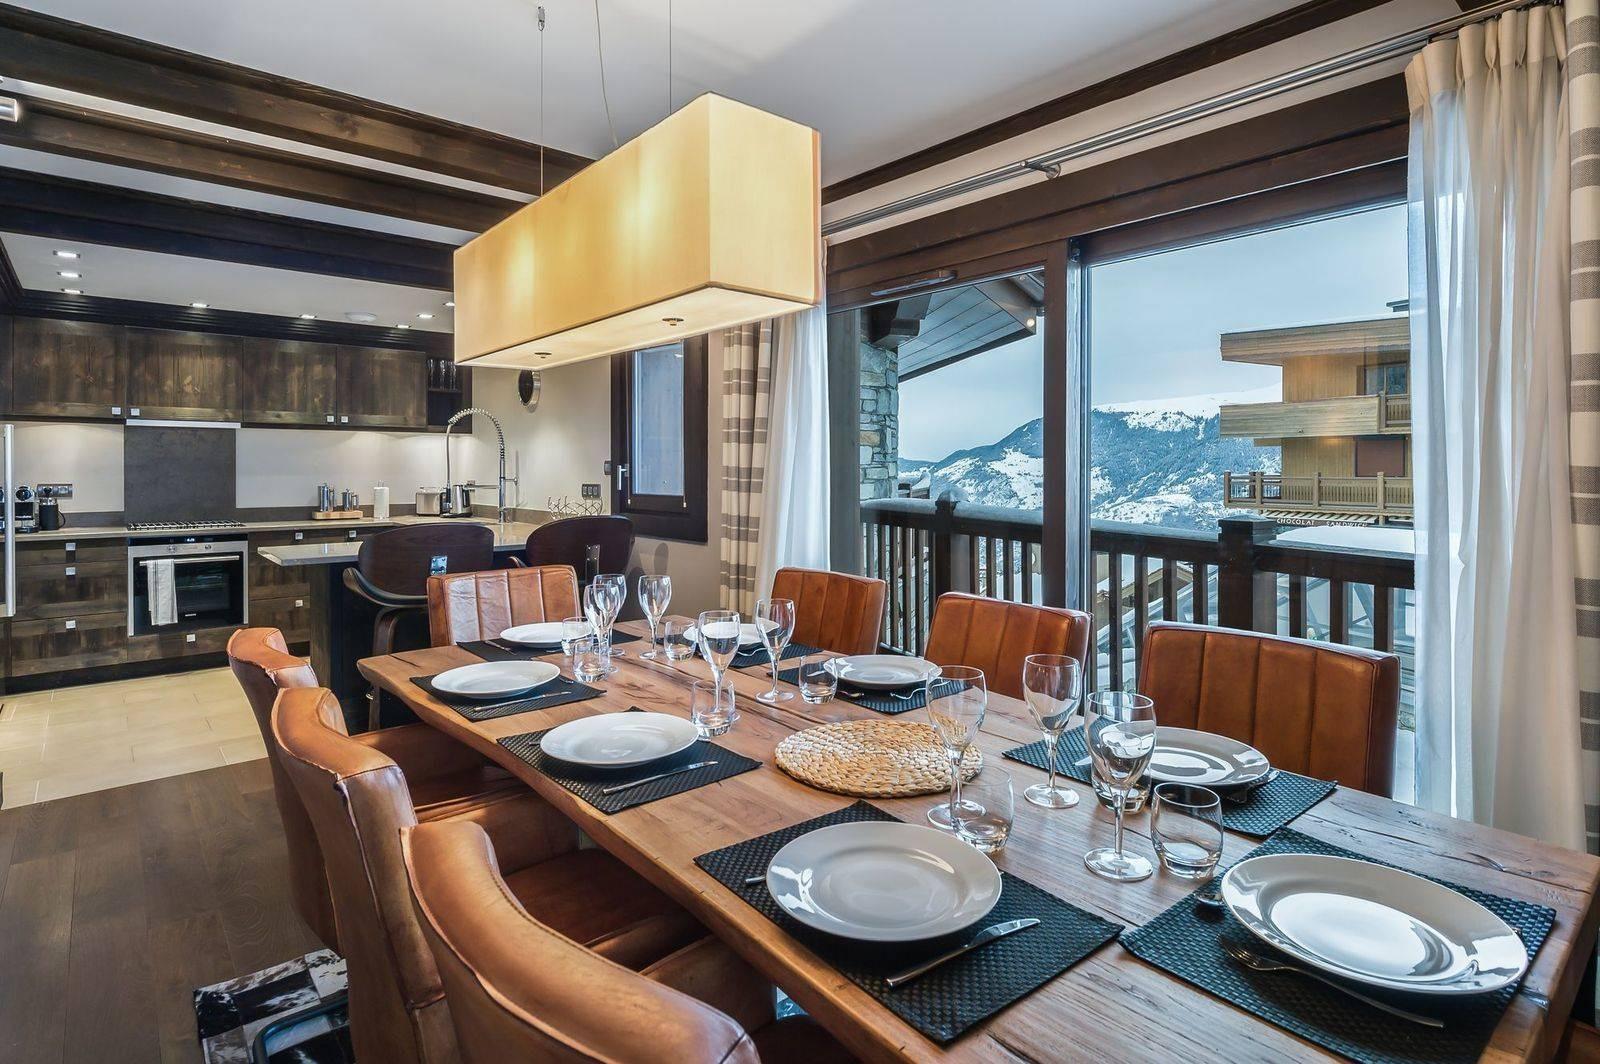 Courchevel 1650 Luxury Rental Appartment Neroflier Dining Room 2